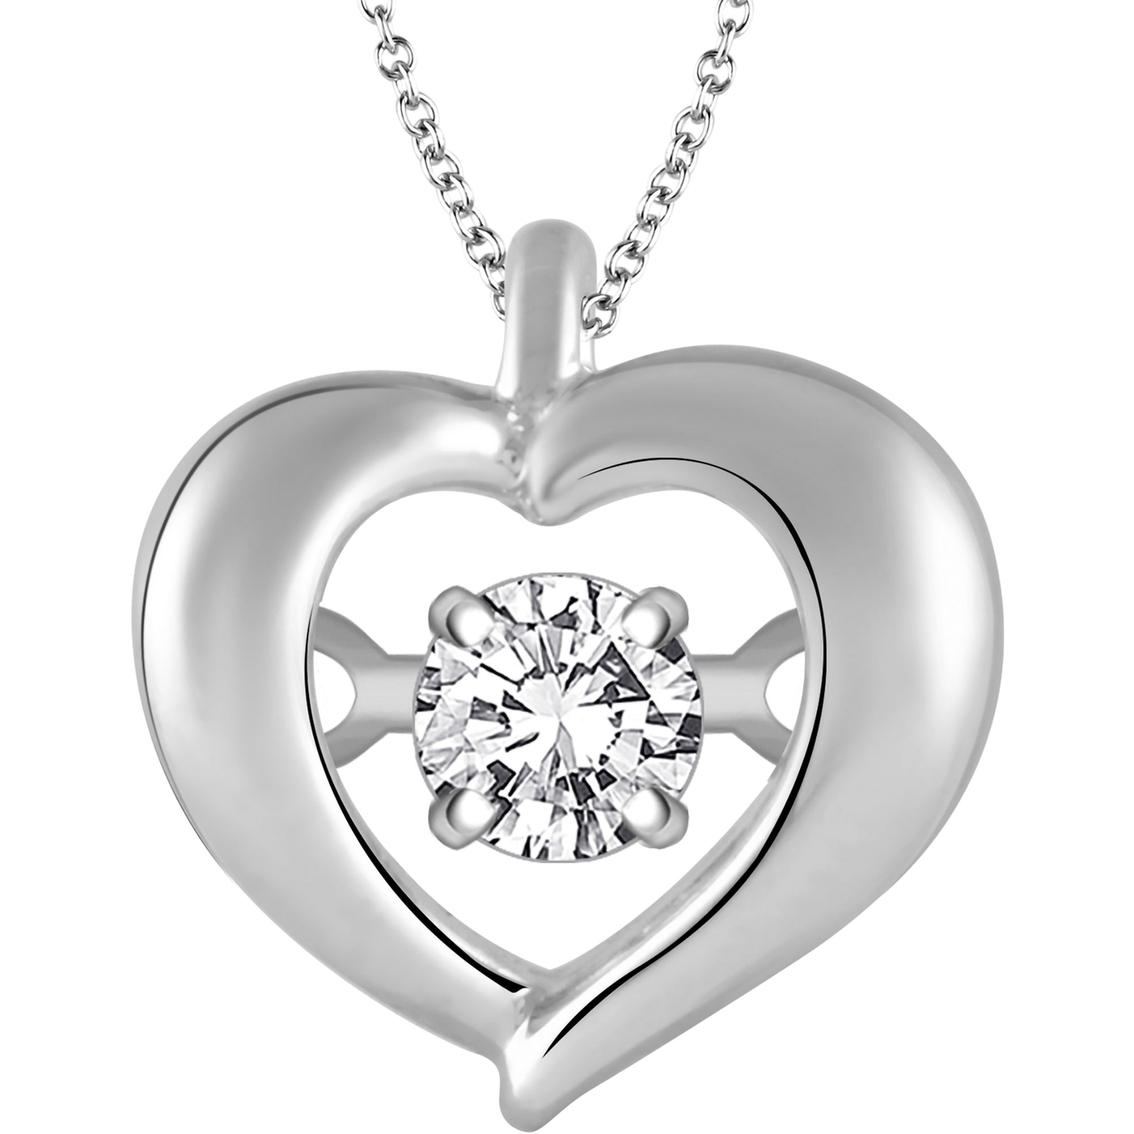 Dazzling diamonds 10k white gold diamond accent heart pendant necklaces pendants diamond heart pendants alkd mozeypictures Gallery